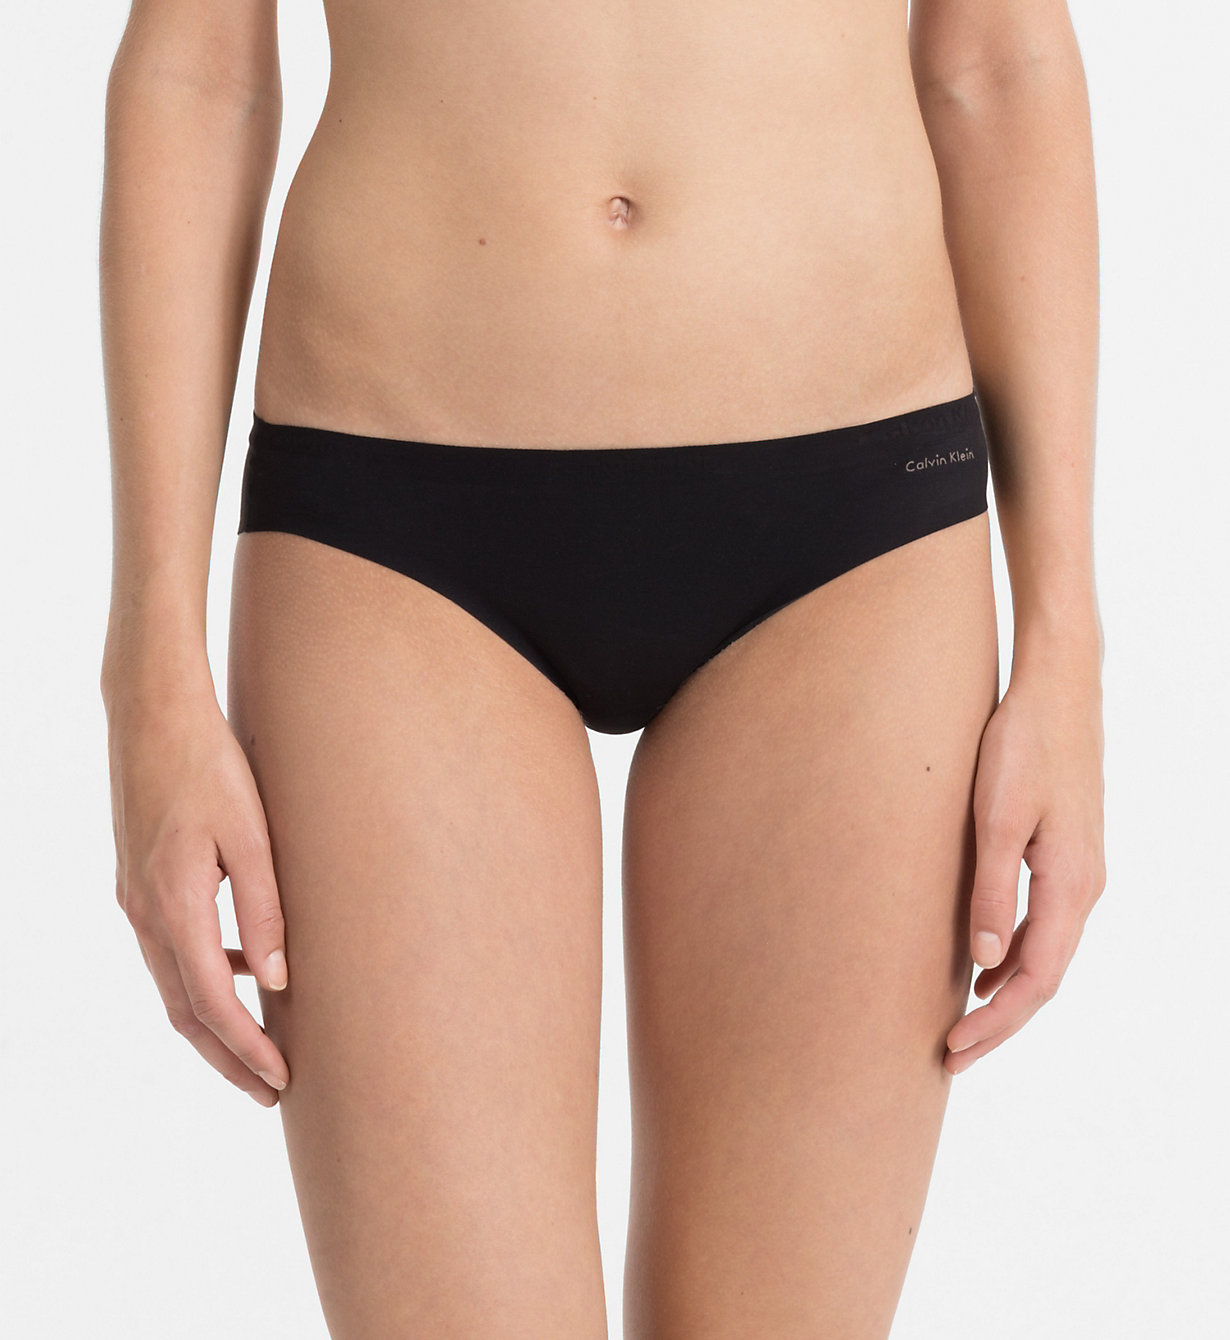 Kalhotky F3843E černá - Calvin Klein Barva: černá, Velikost: M